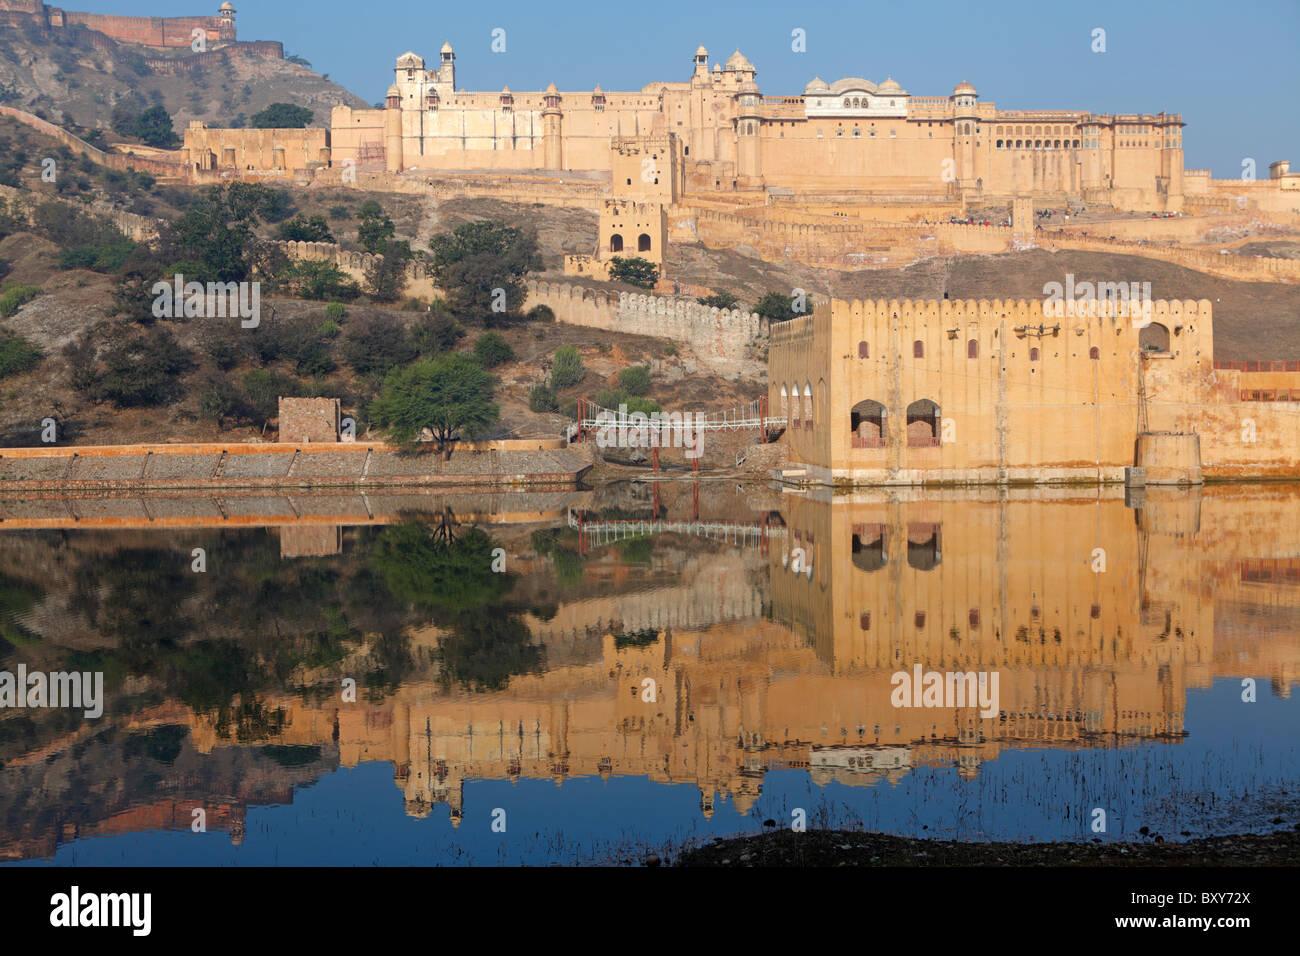 Il Forte Amber riflessa nel lago Maotha, Jaipur, India Immagini Stock